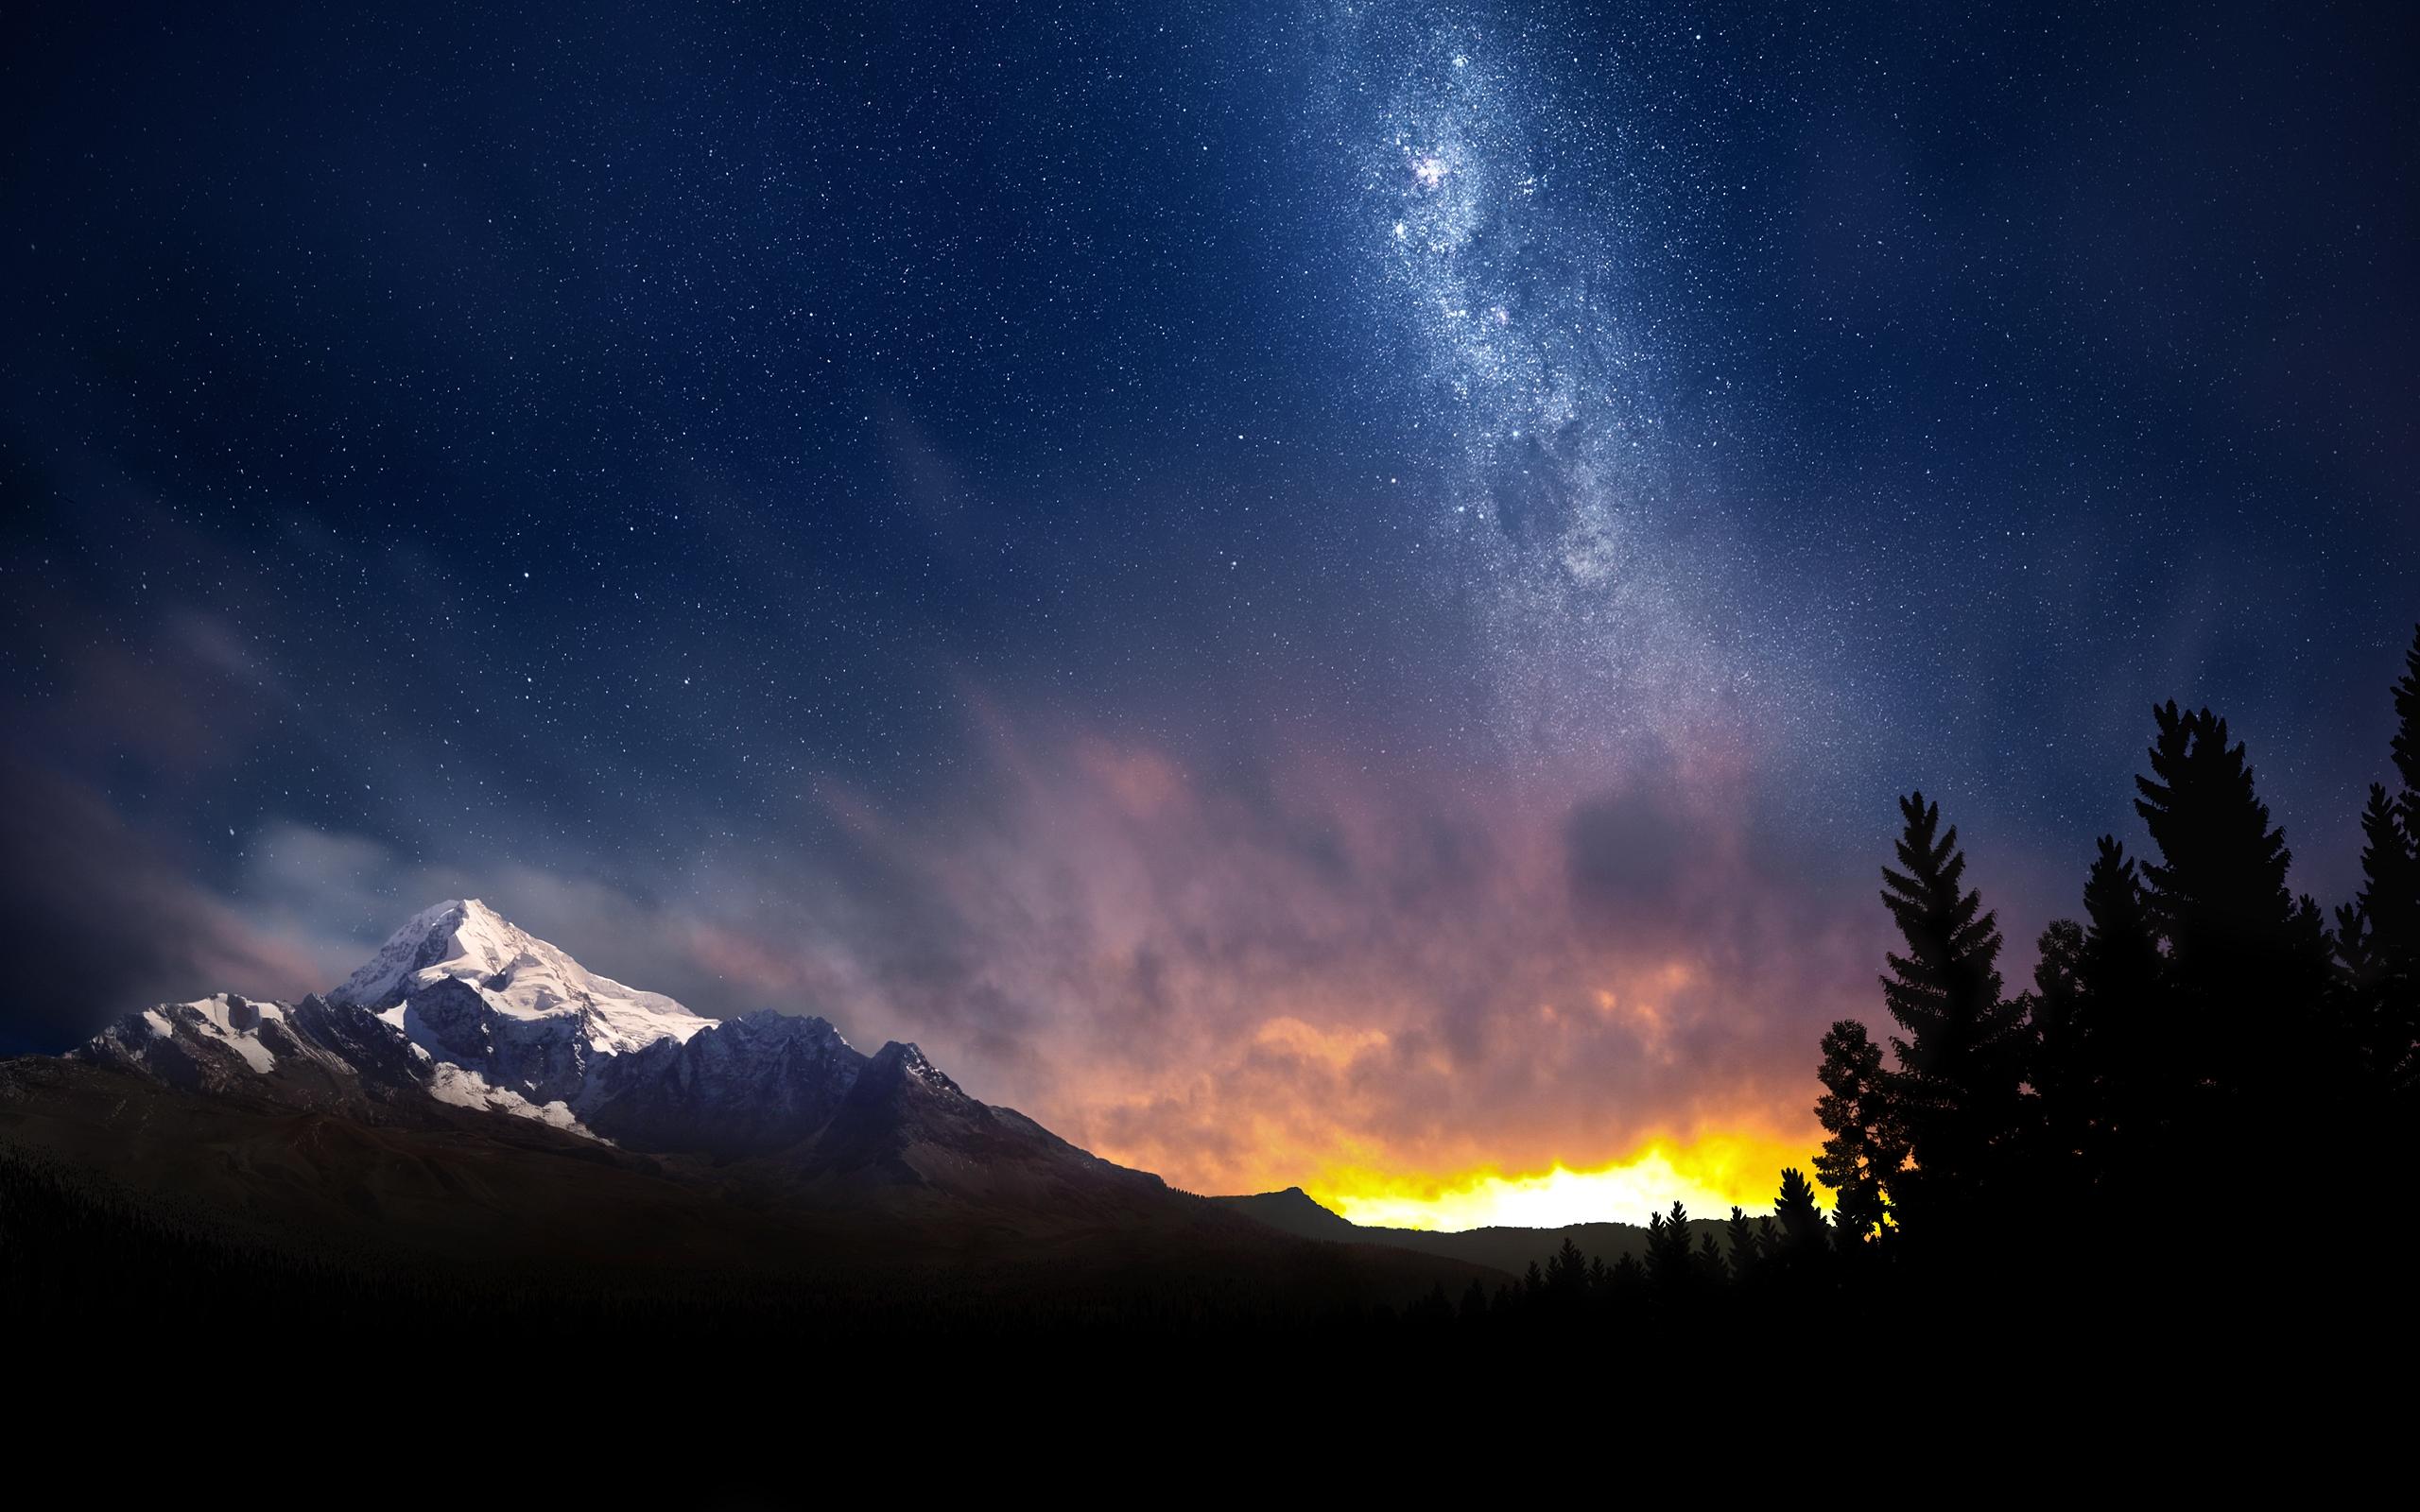 Swiss Night Sky Wallpapers HD Wallpapers 2560x1600